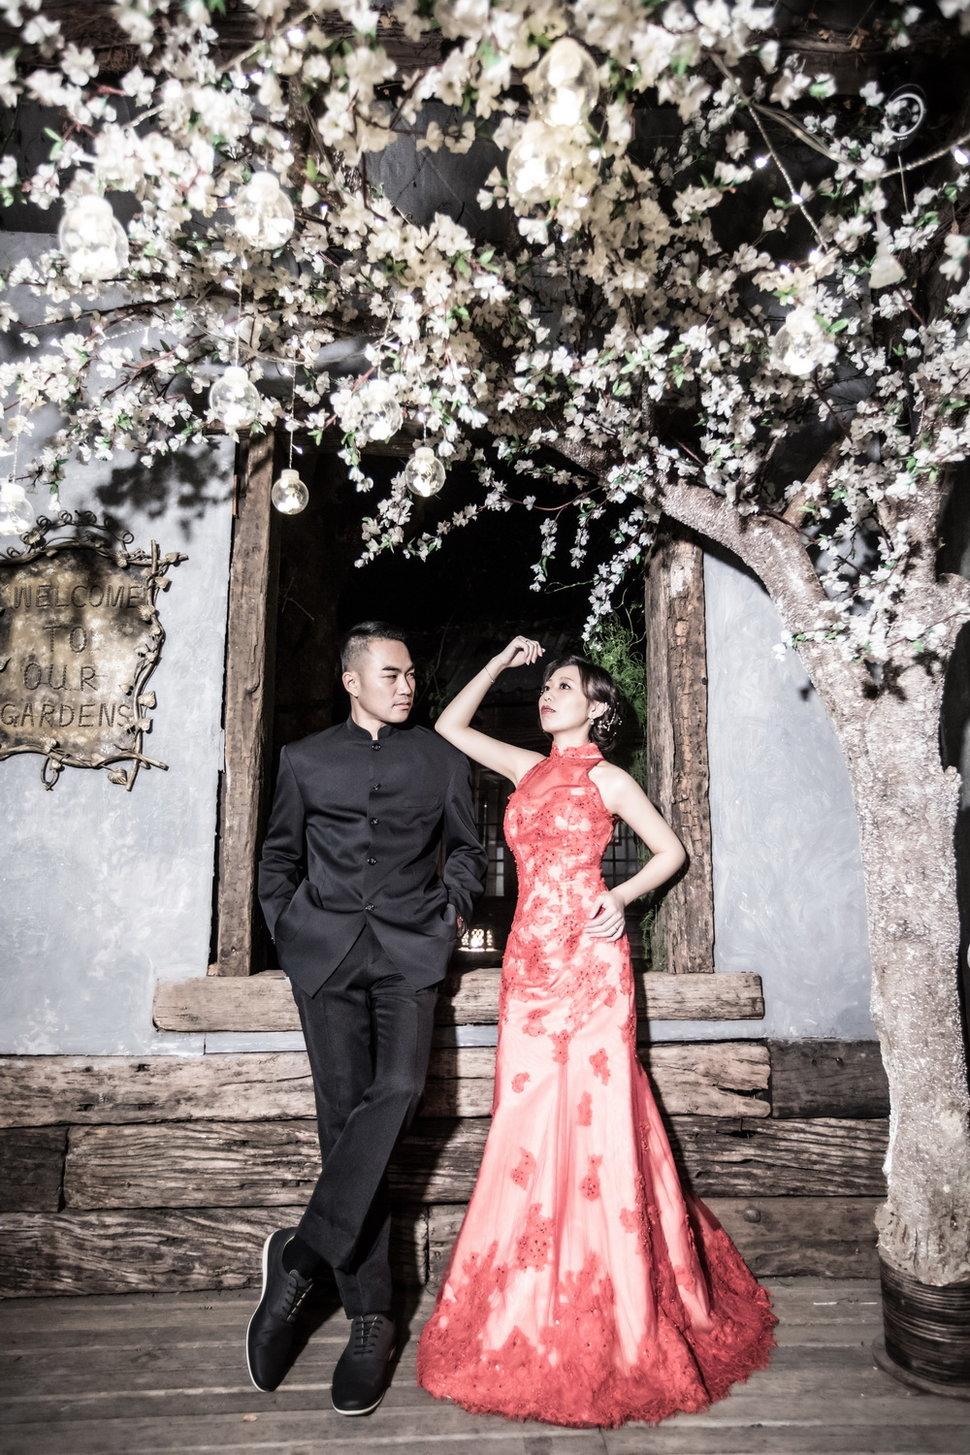 IMG_8963-1 - 春之嫁衣精緻婚紗 - 結婚吧